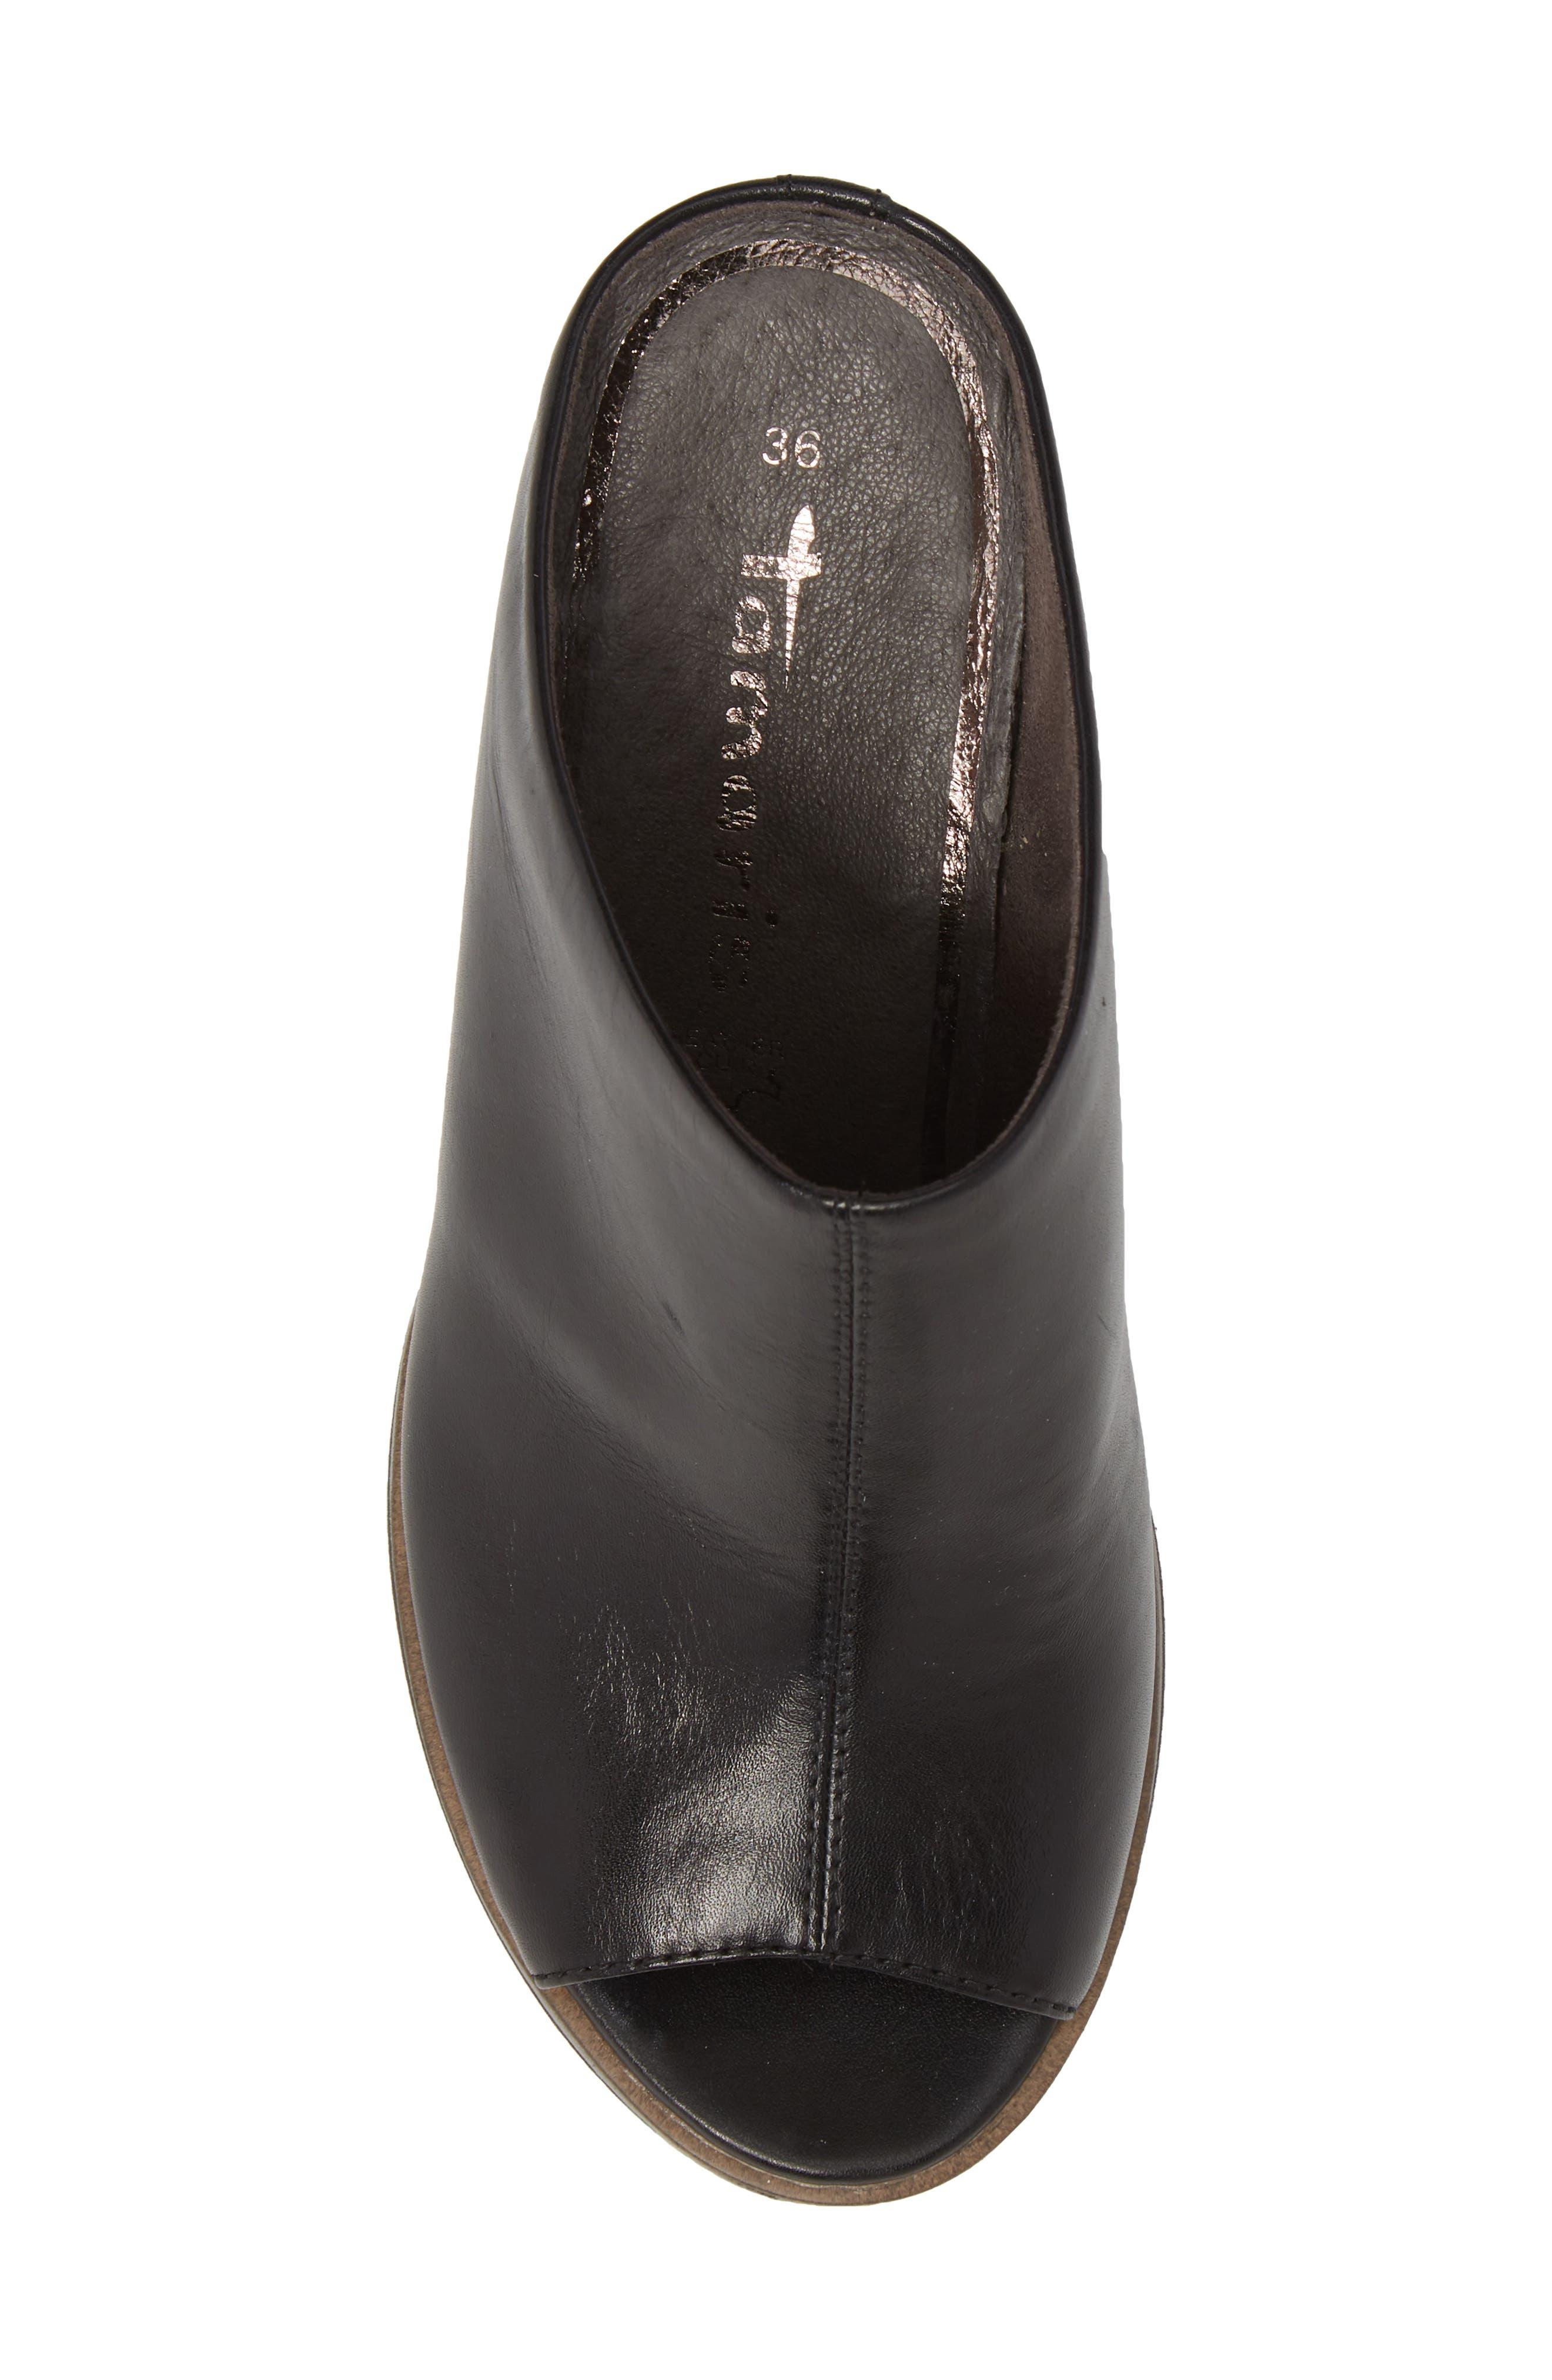 Alis Wedge Sandal,                             Alternate thumbnail 5, color,                             Black/ Black Leather